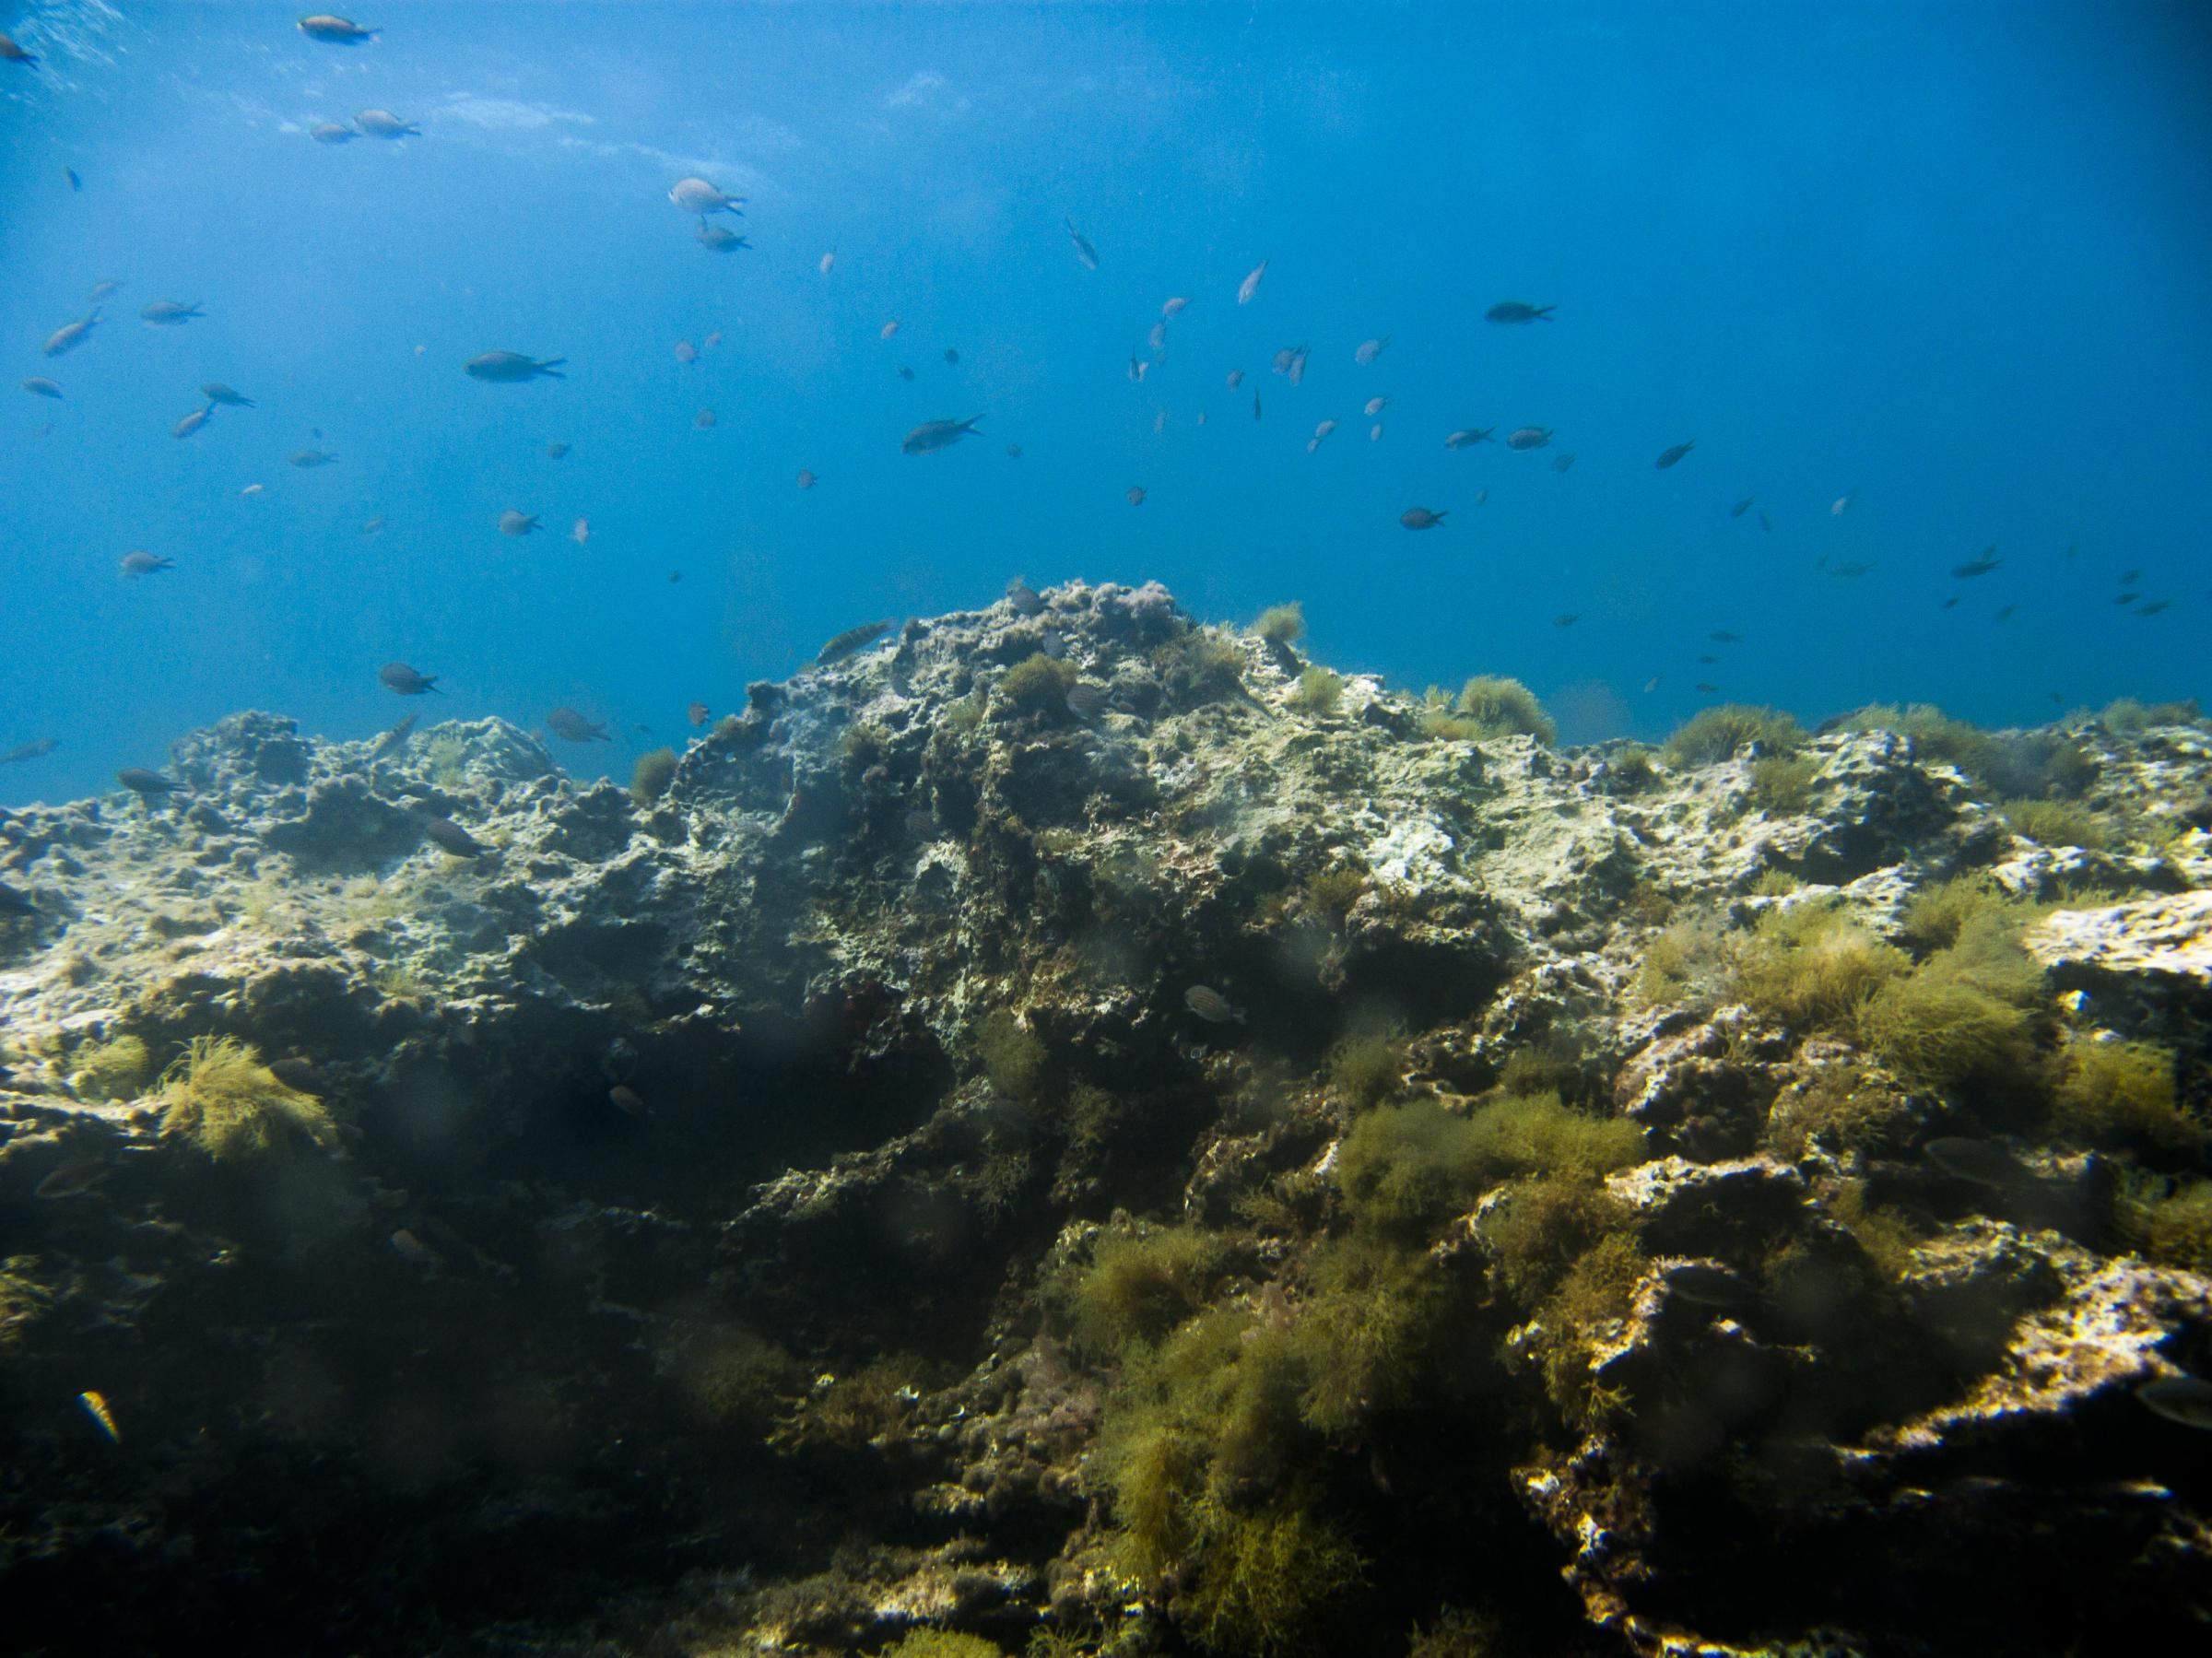 Fortizza Reef dive site